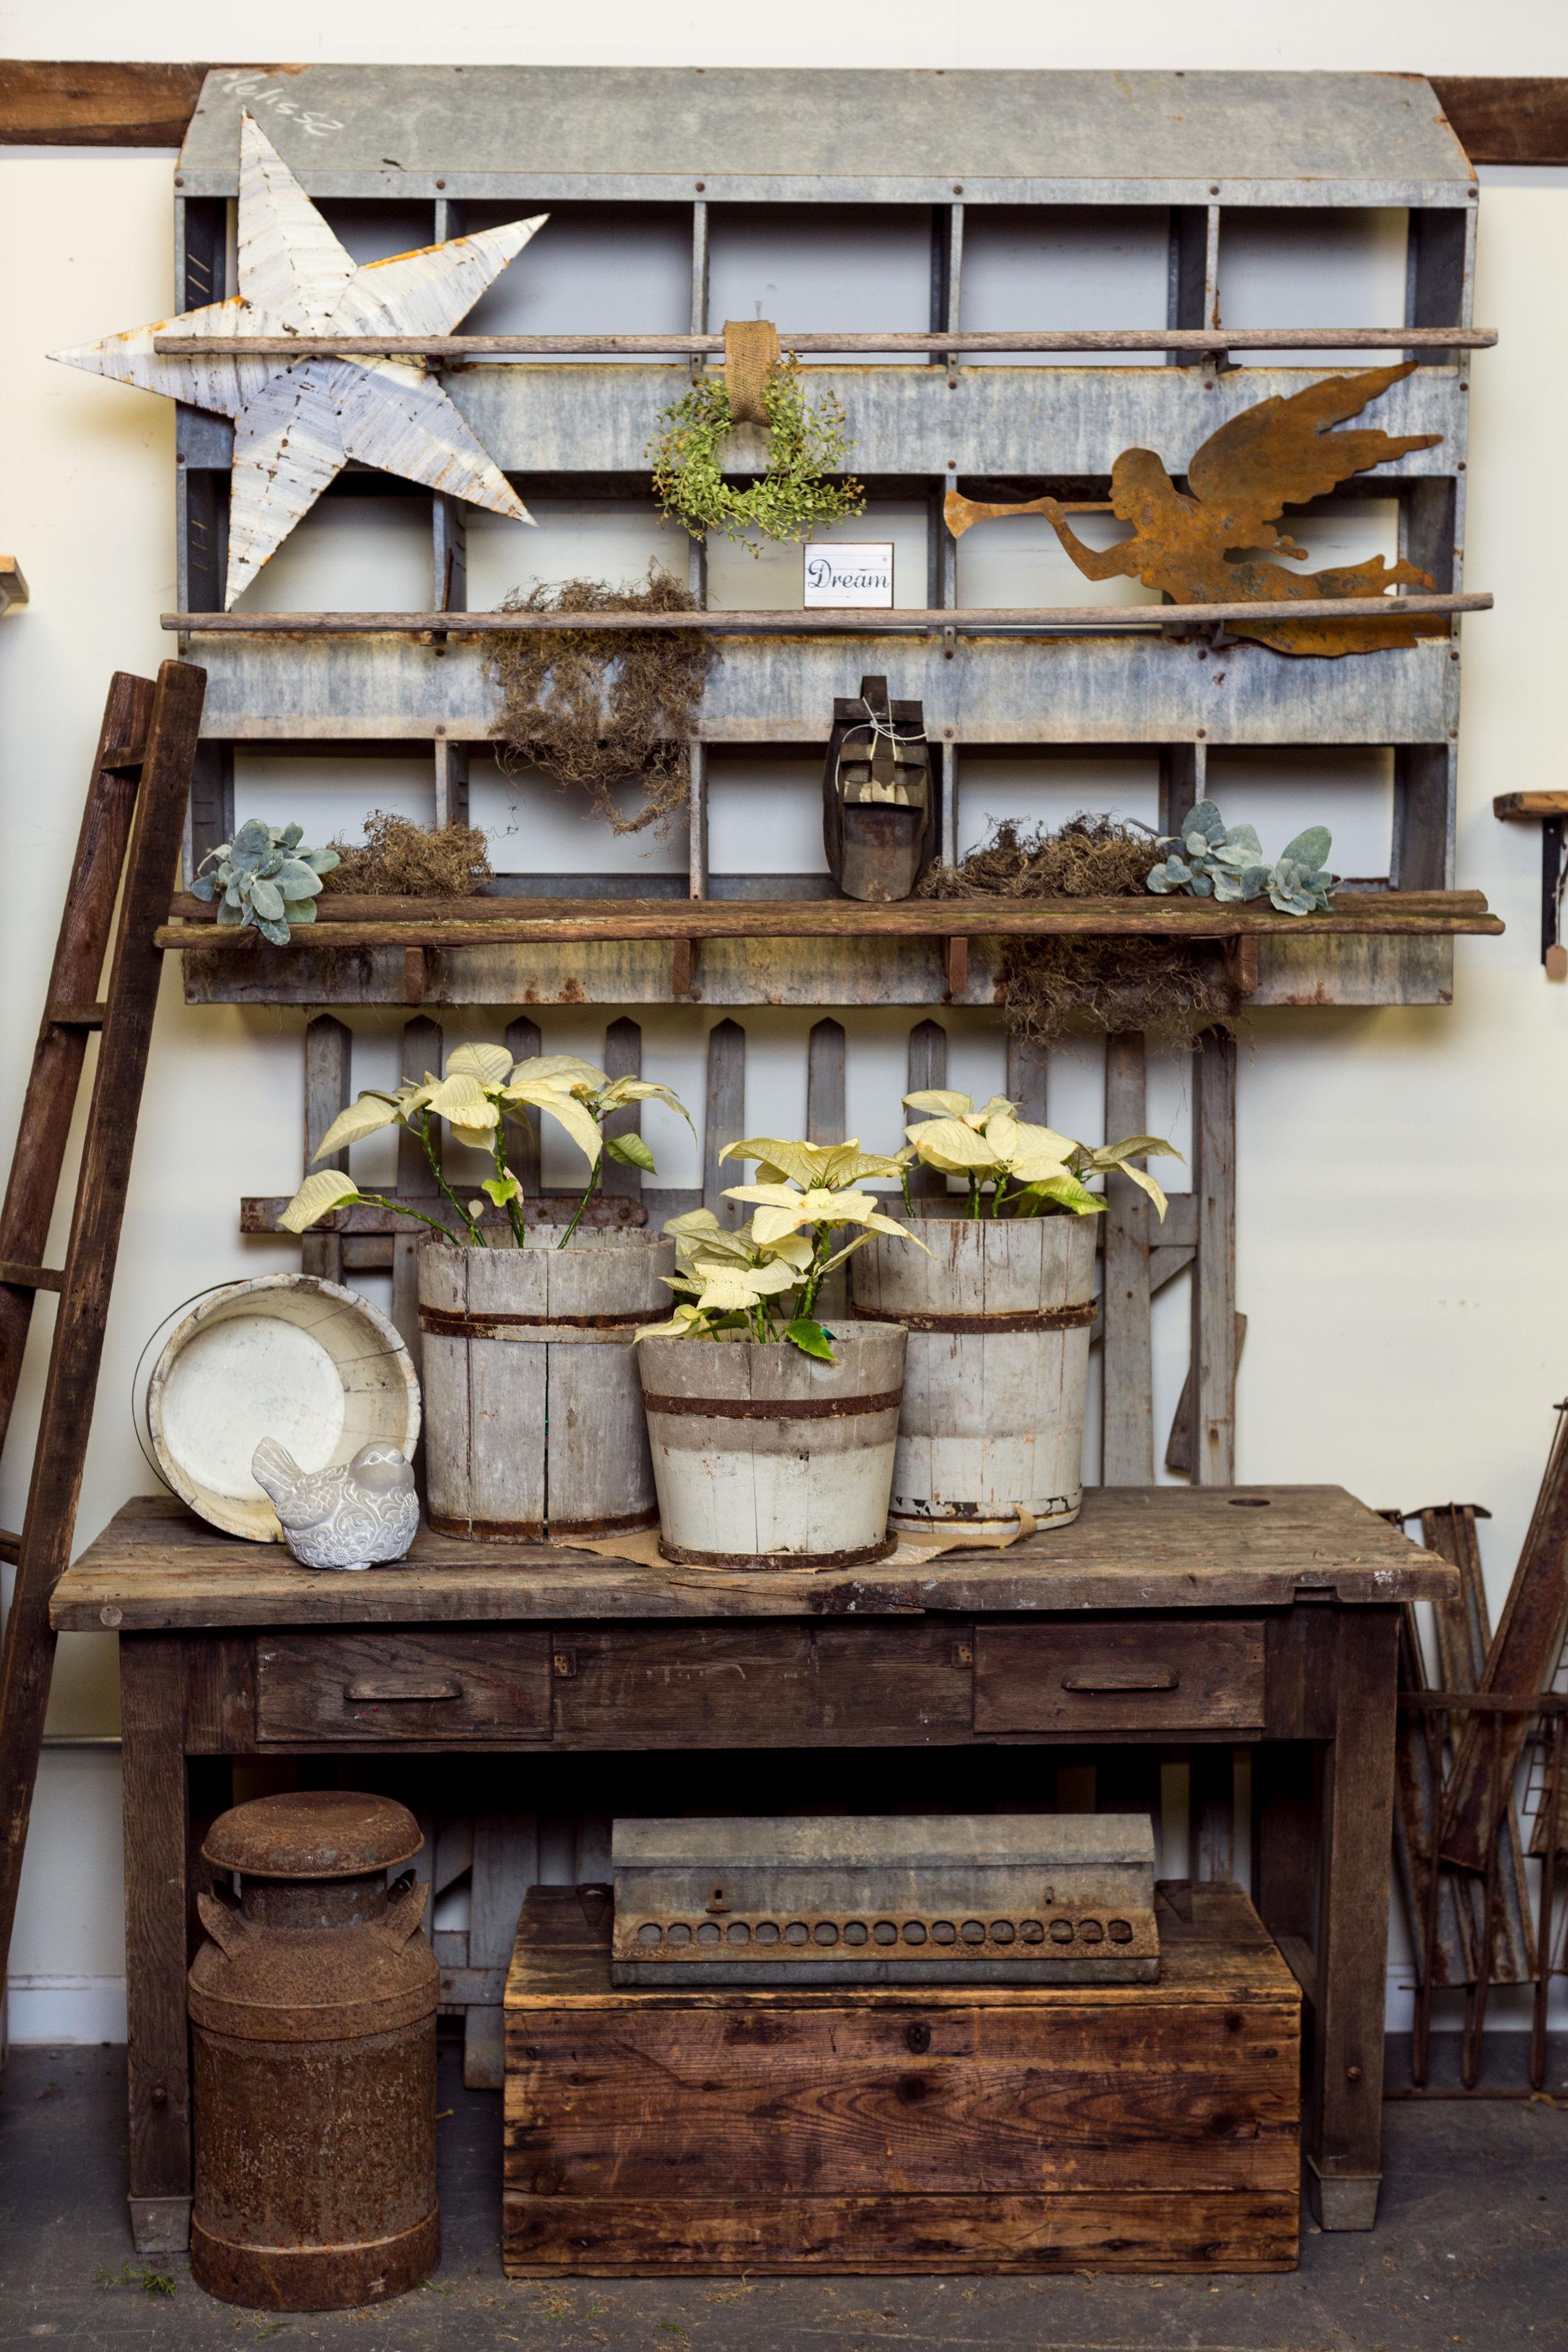 Farmhouse decor at Revival